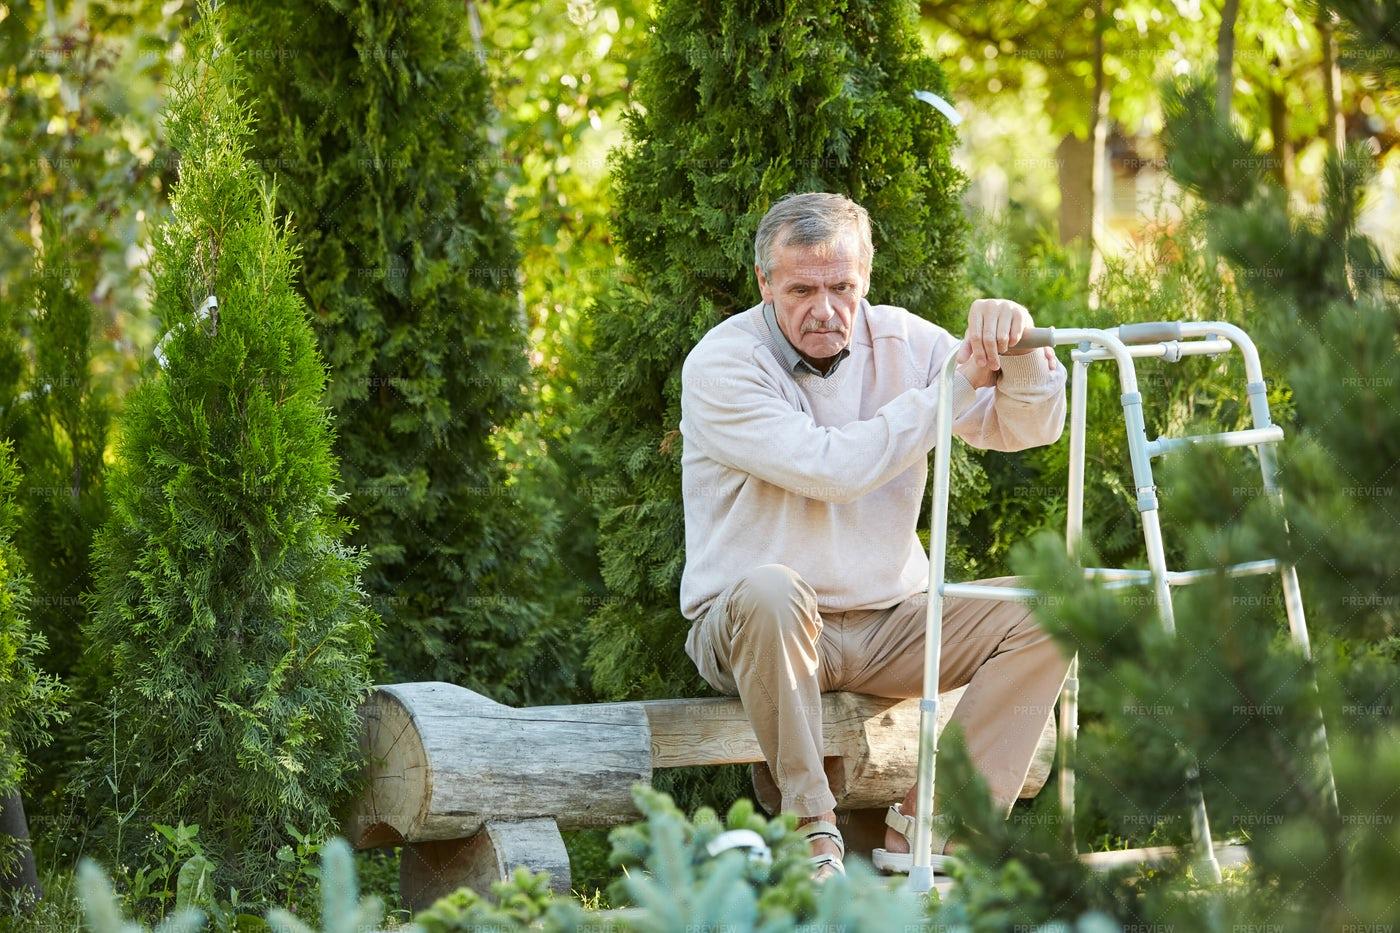 Depressed Senior Man With Walker: Stock Photos